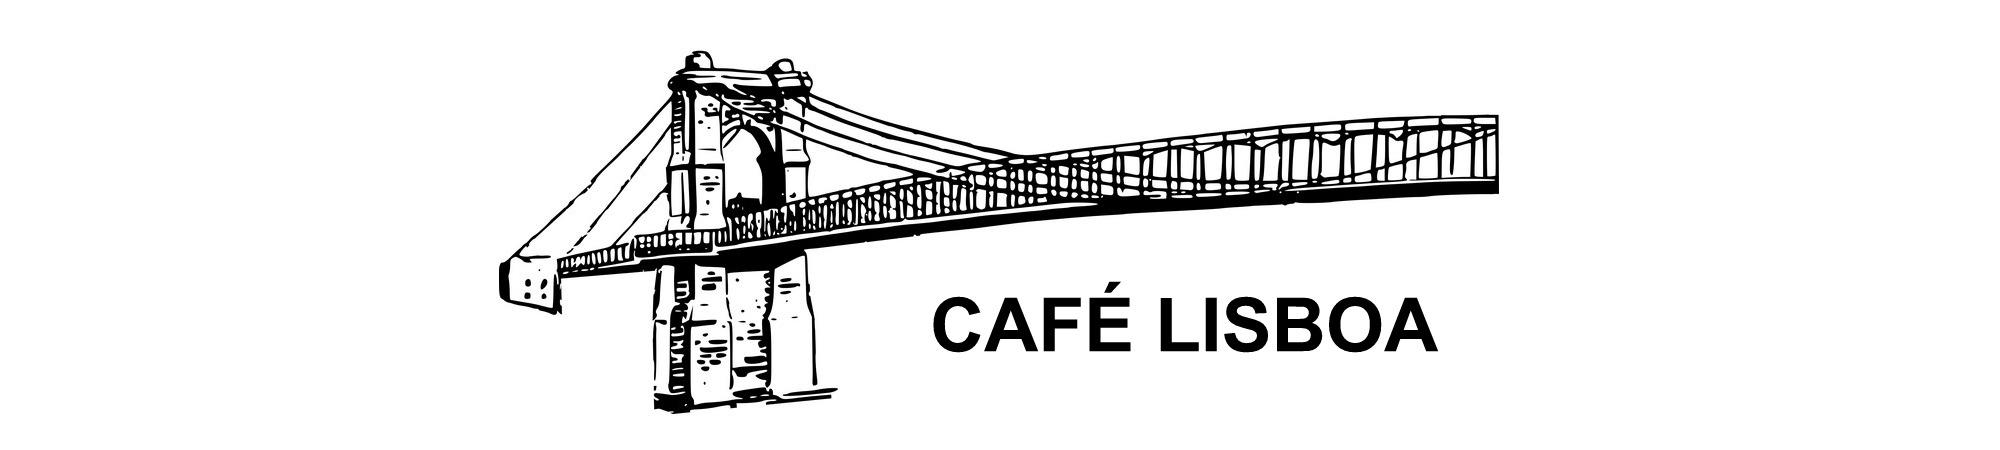 cafe lisboa en motril, cafe lisboa motril, cafeterias en motril, cafeterias en salobreña,